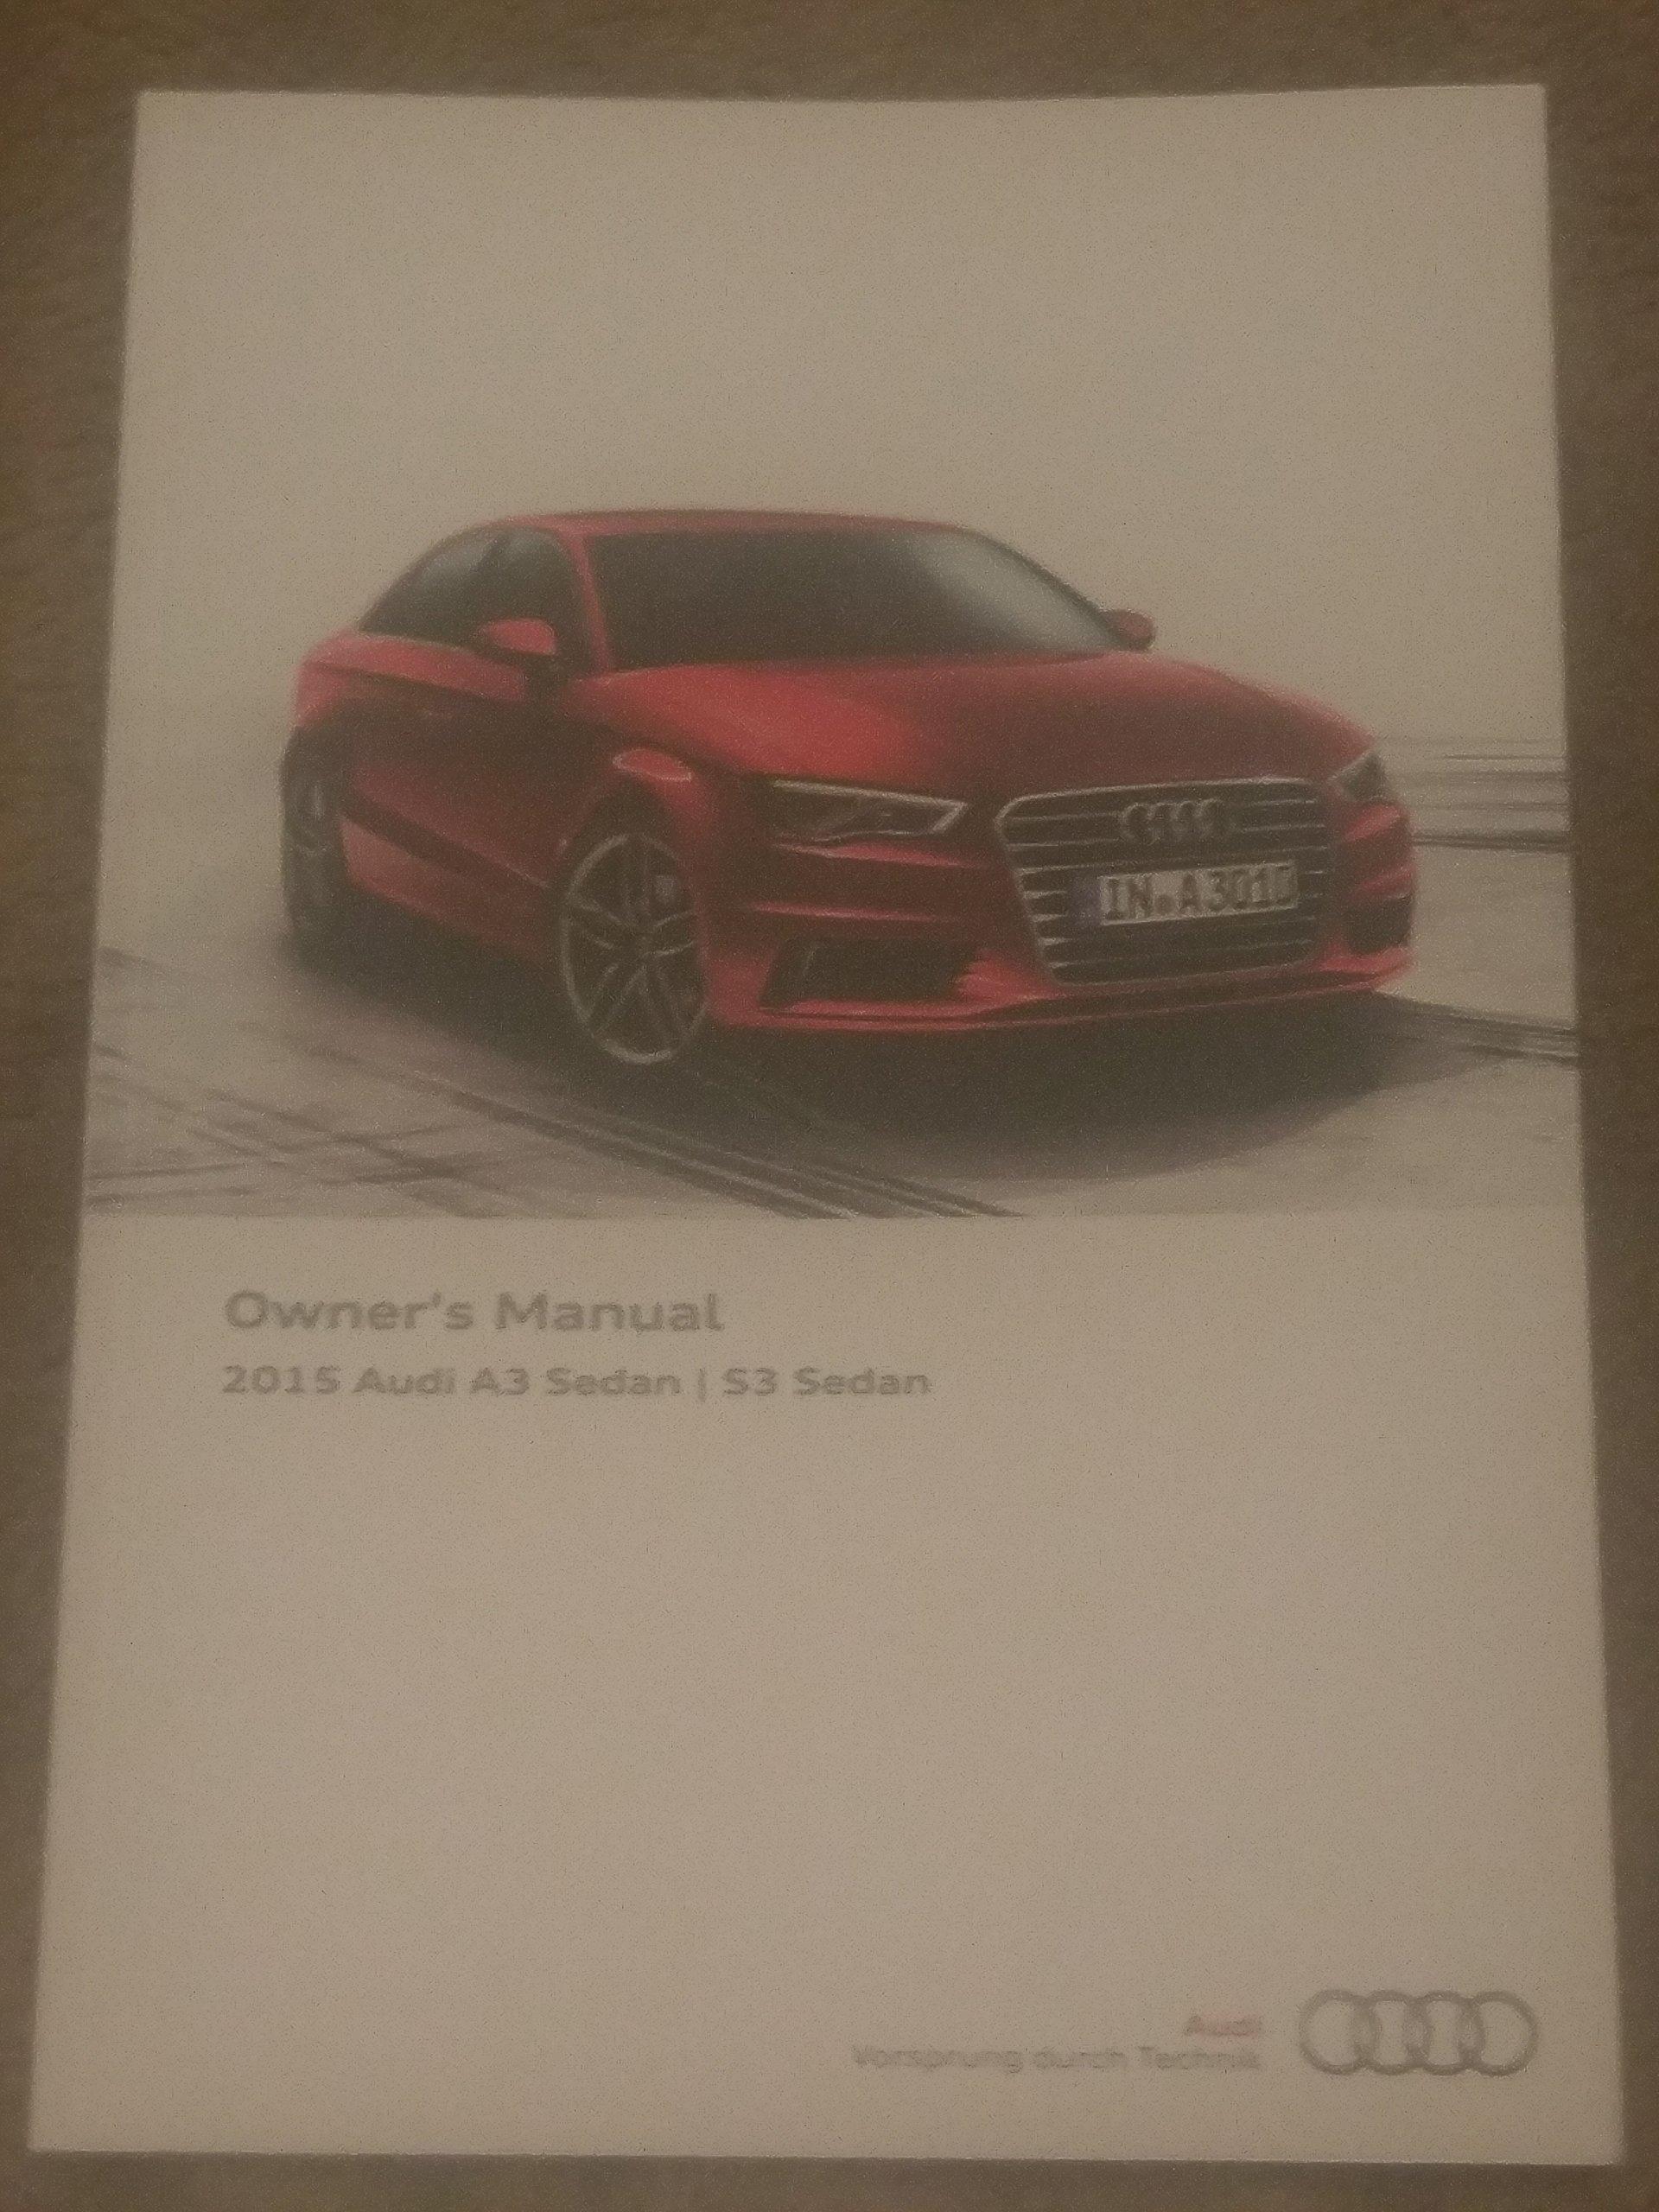 2015 audi a3 owner s manual audi 0759624999619 amazon com books rh amazon com audi a3 2015 owners manual pdf 2015 audi a3 1.8t owners manual